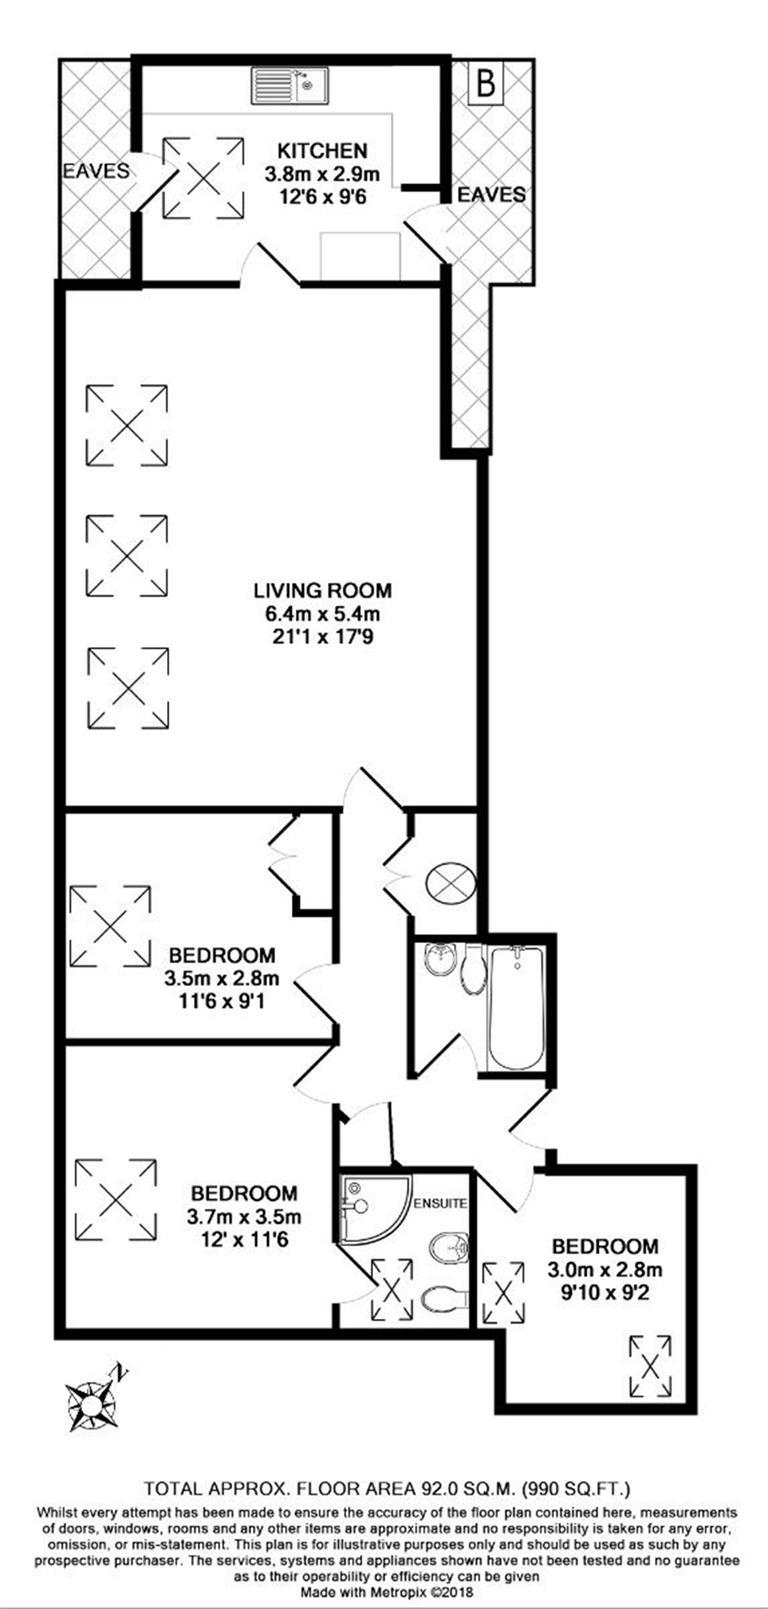 http://www.dezrez.com/estate-agent-software/ImageResizeHandler.do?PropertyID=4586526&photoID=8&AgentID=224&BranchID=333&width=768